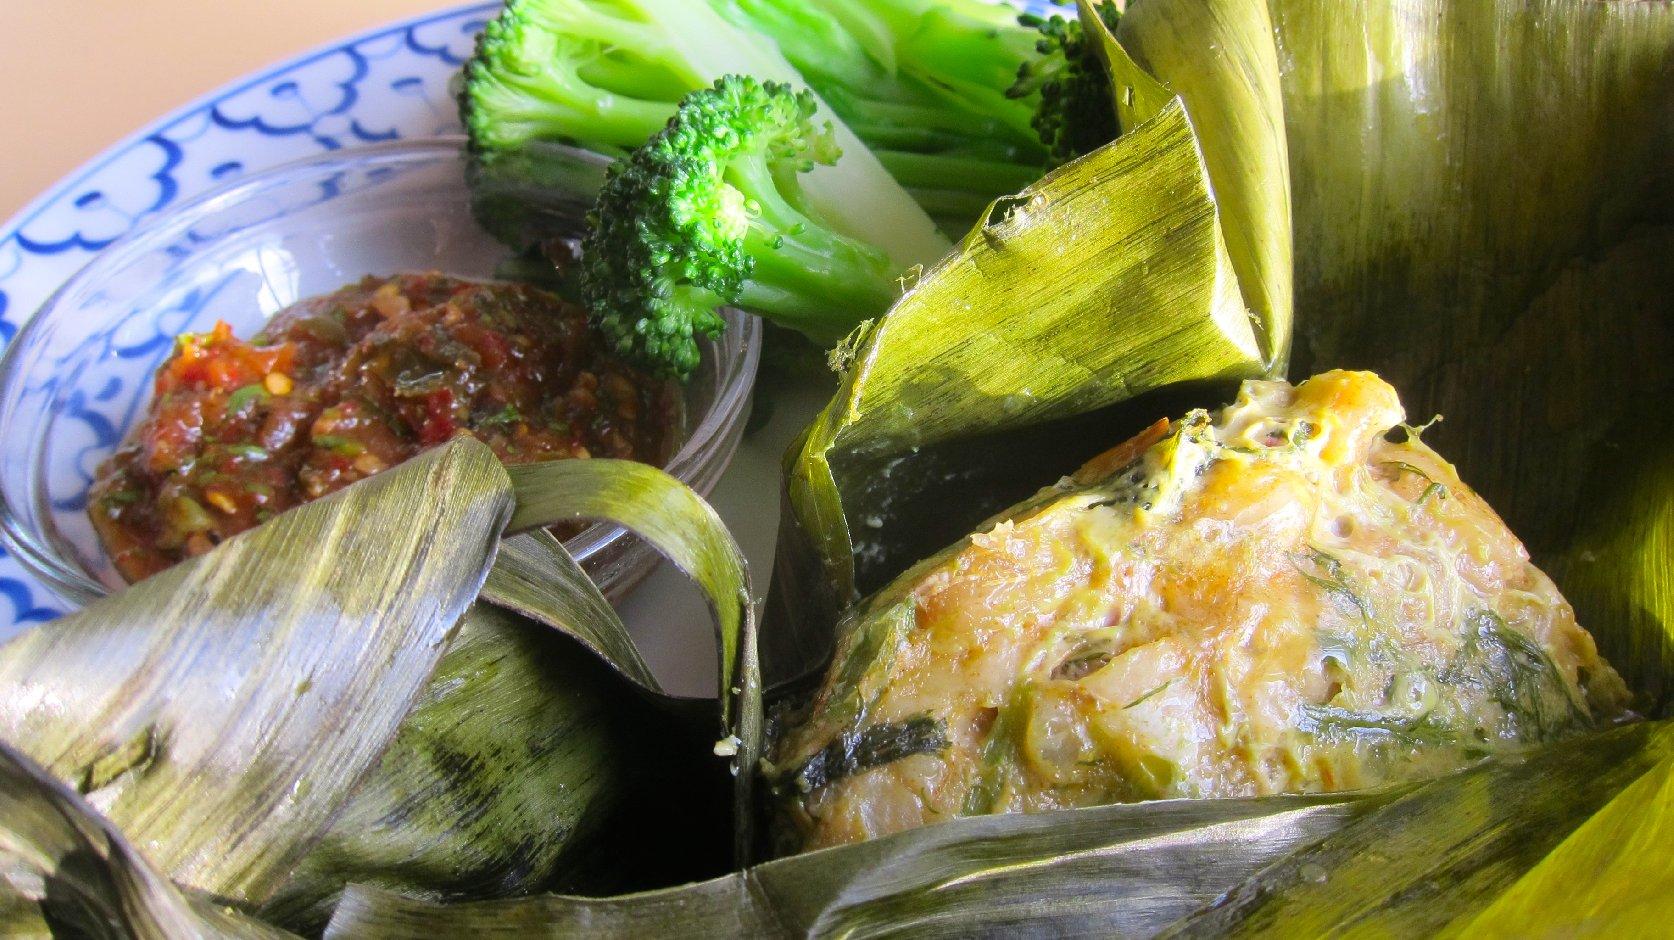 Mok pla (steamed catfish)